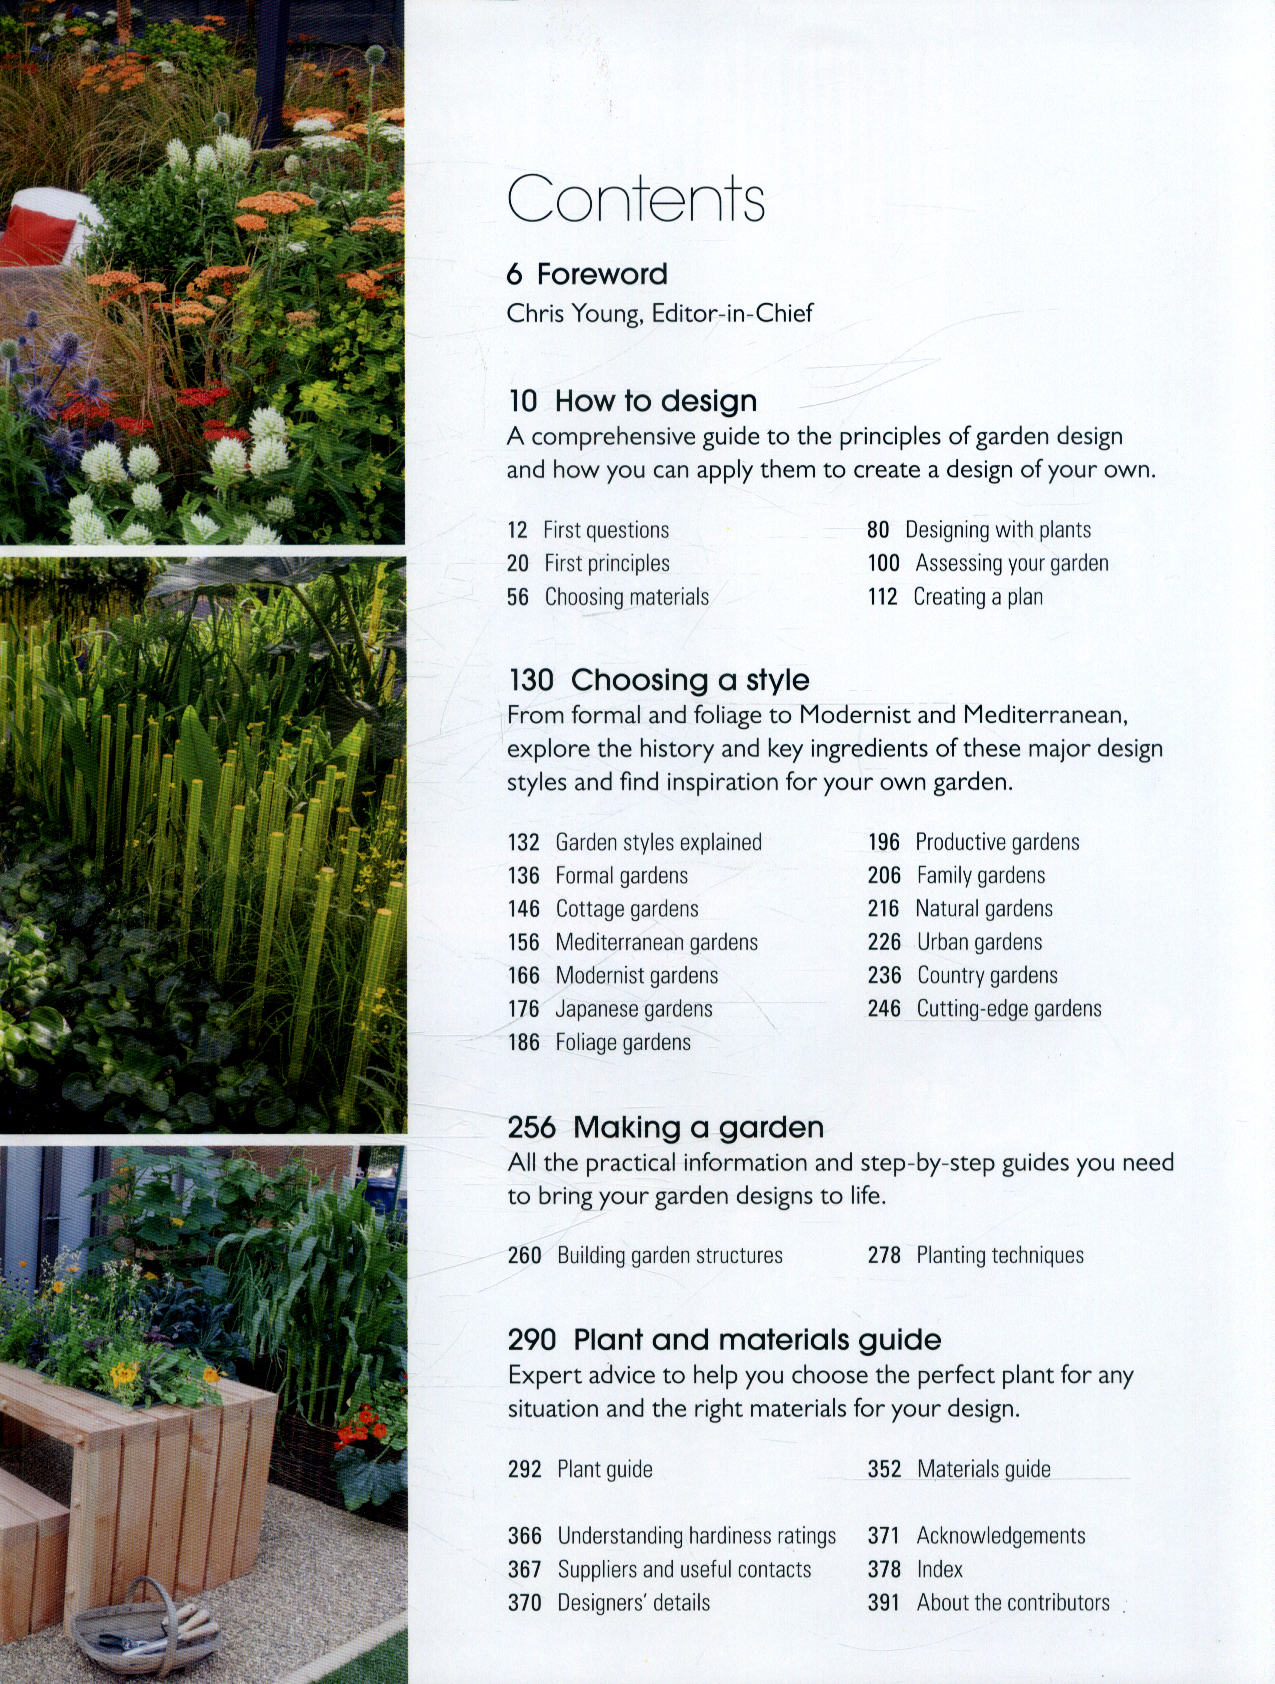 Encyclopedia Of Garden Design By DK (9780241286135